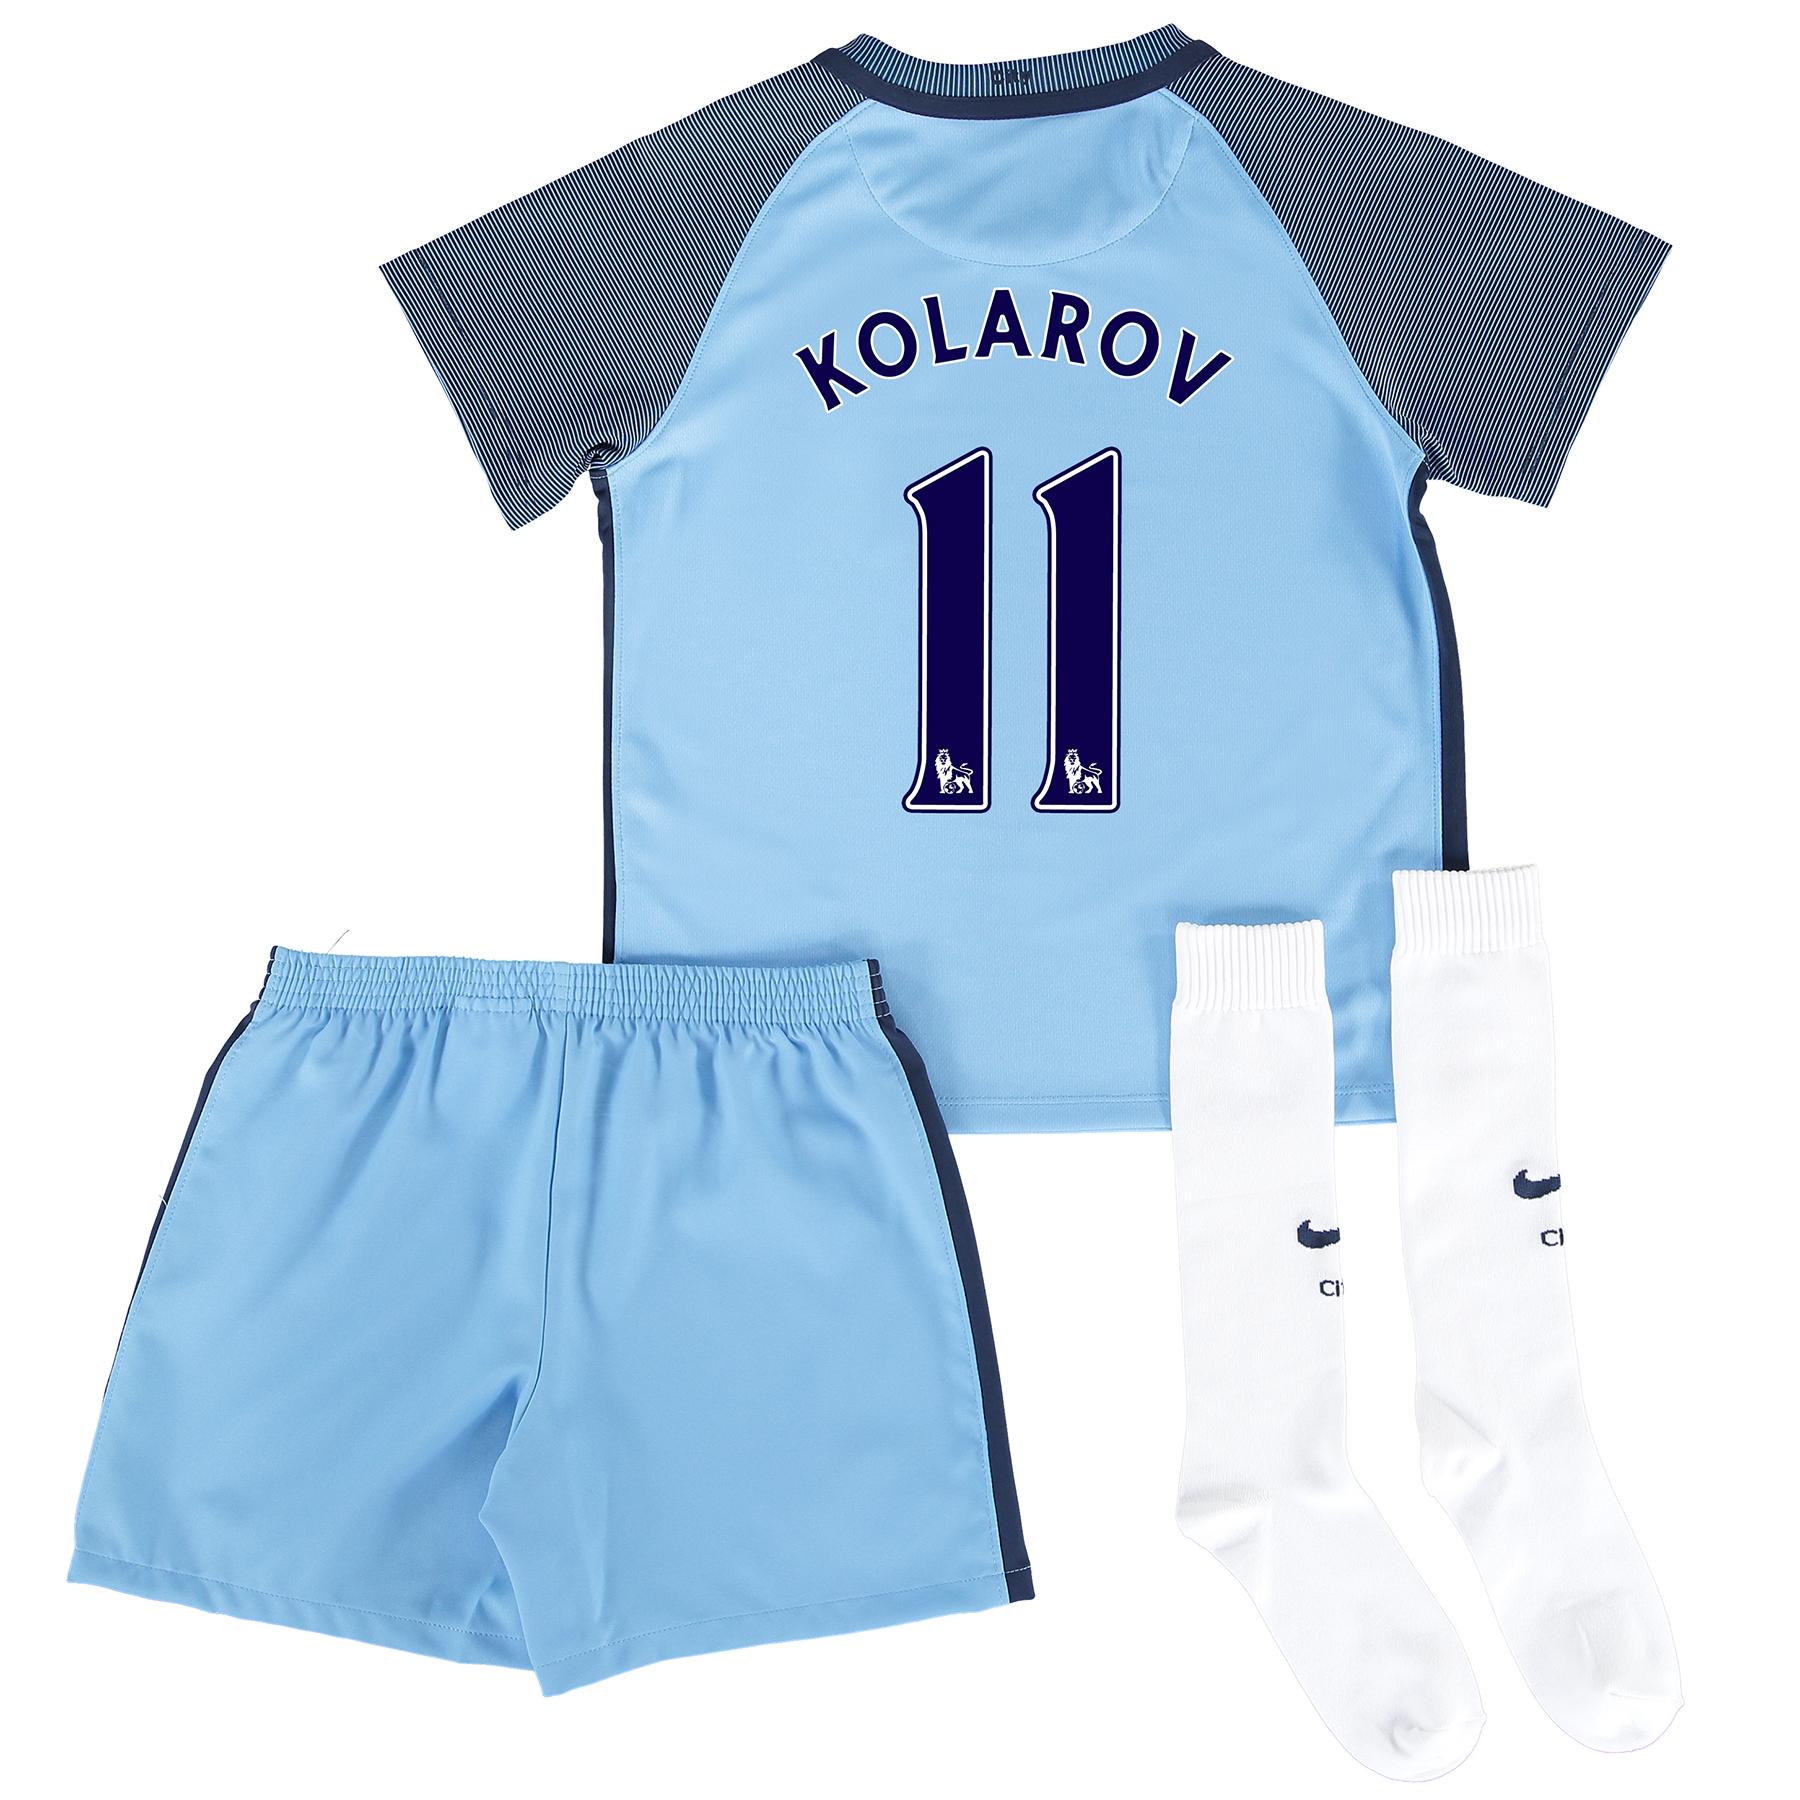 Manchester City Home Kit 2016-17 - Little Kids with Kolarov 11 printin